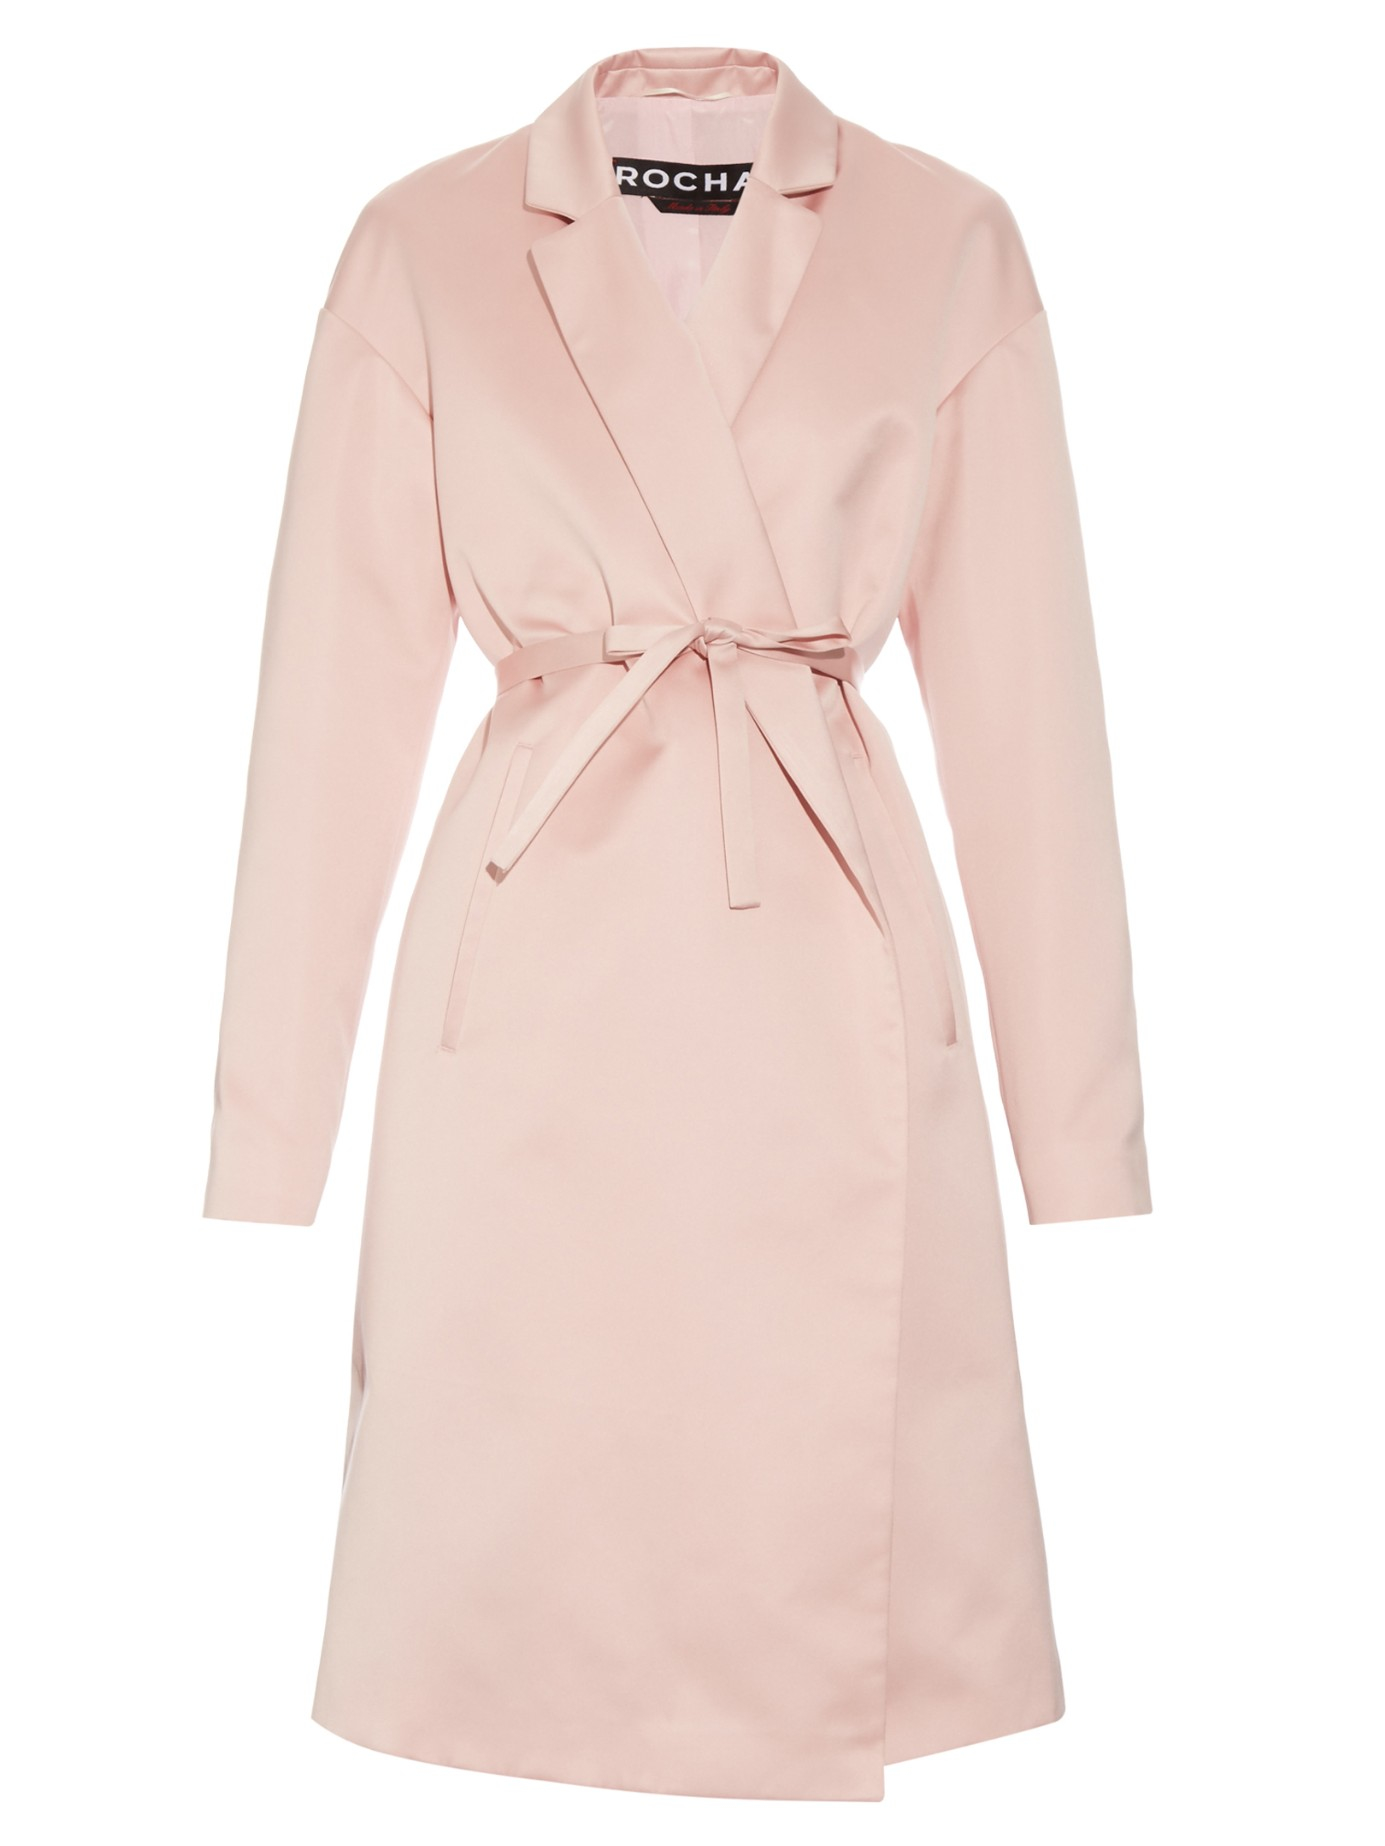 Rochas Self-tie Waist Duchess-satin Coat in Pink | Lyst